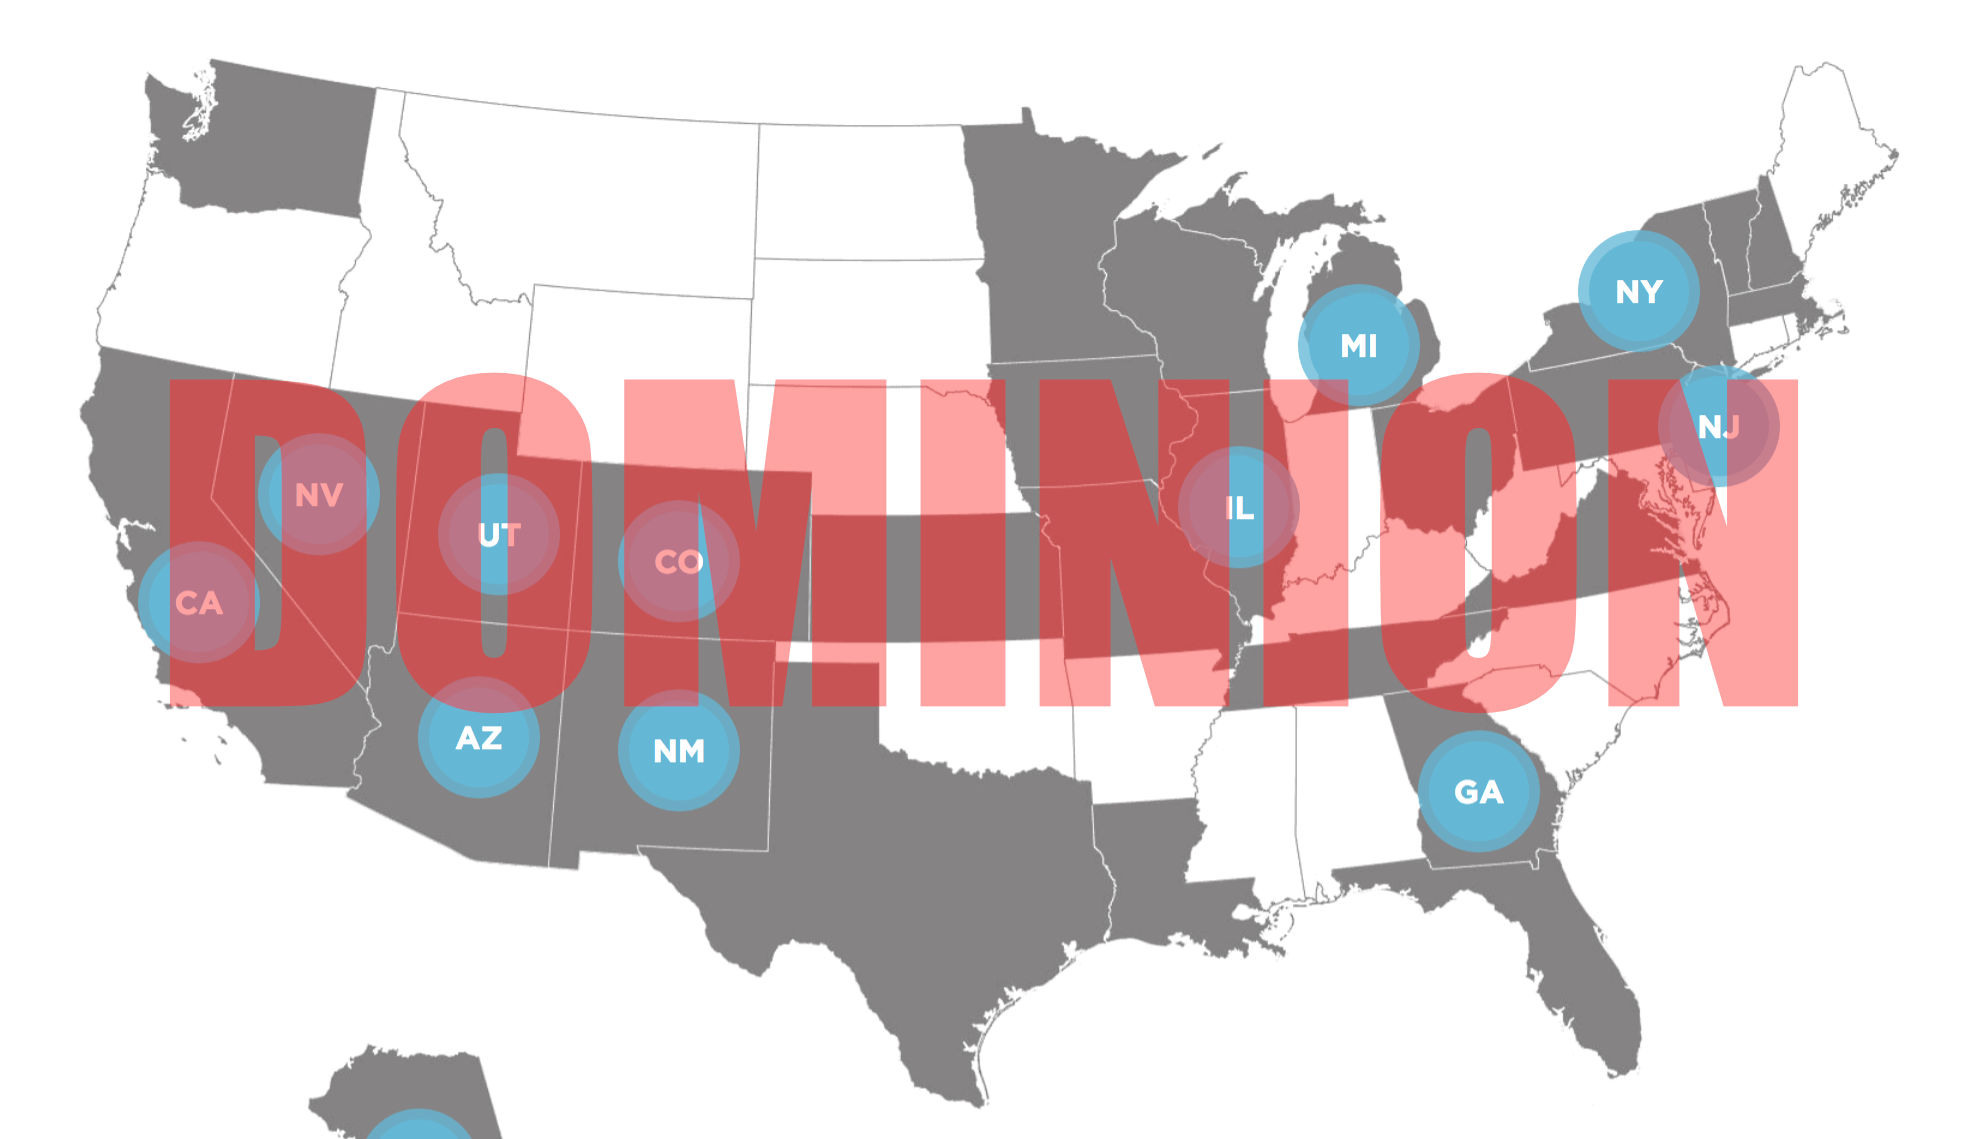 FBI Whistleblower Dominion Software Critical Insider Threat to Elections - PatriotBites.com